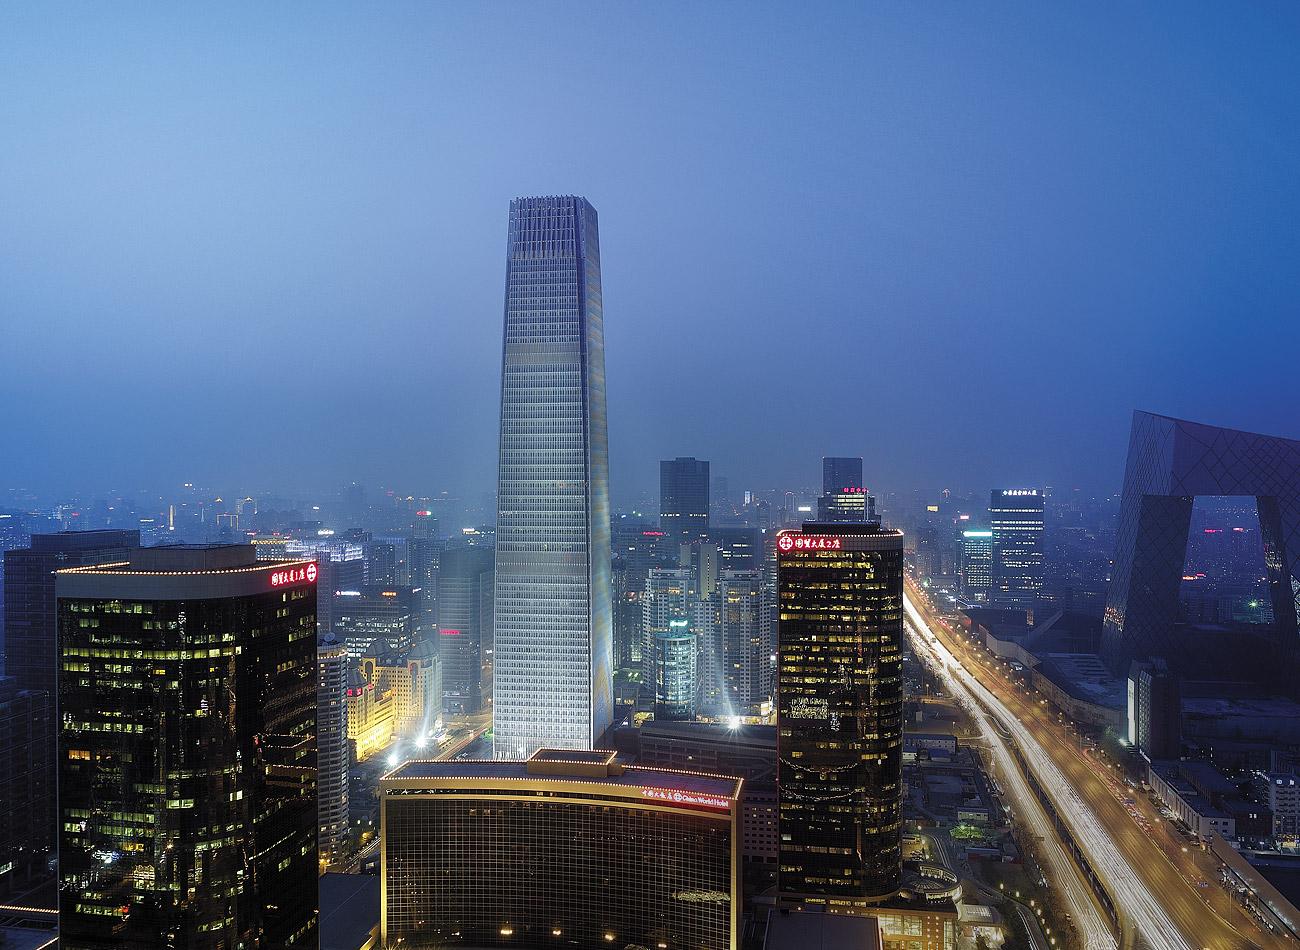 Gedung China World Summit Wing di Beijing. Di dalamnya terdapat Hotel Shangri-La.